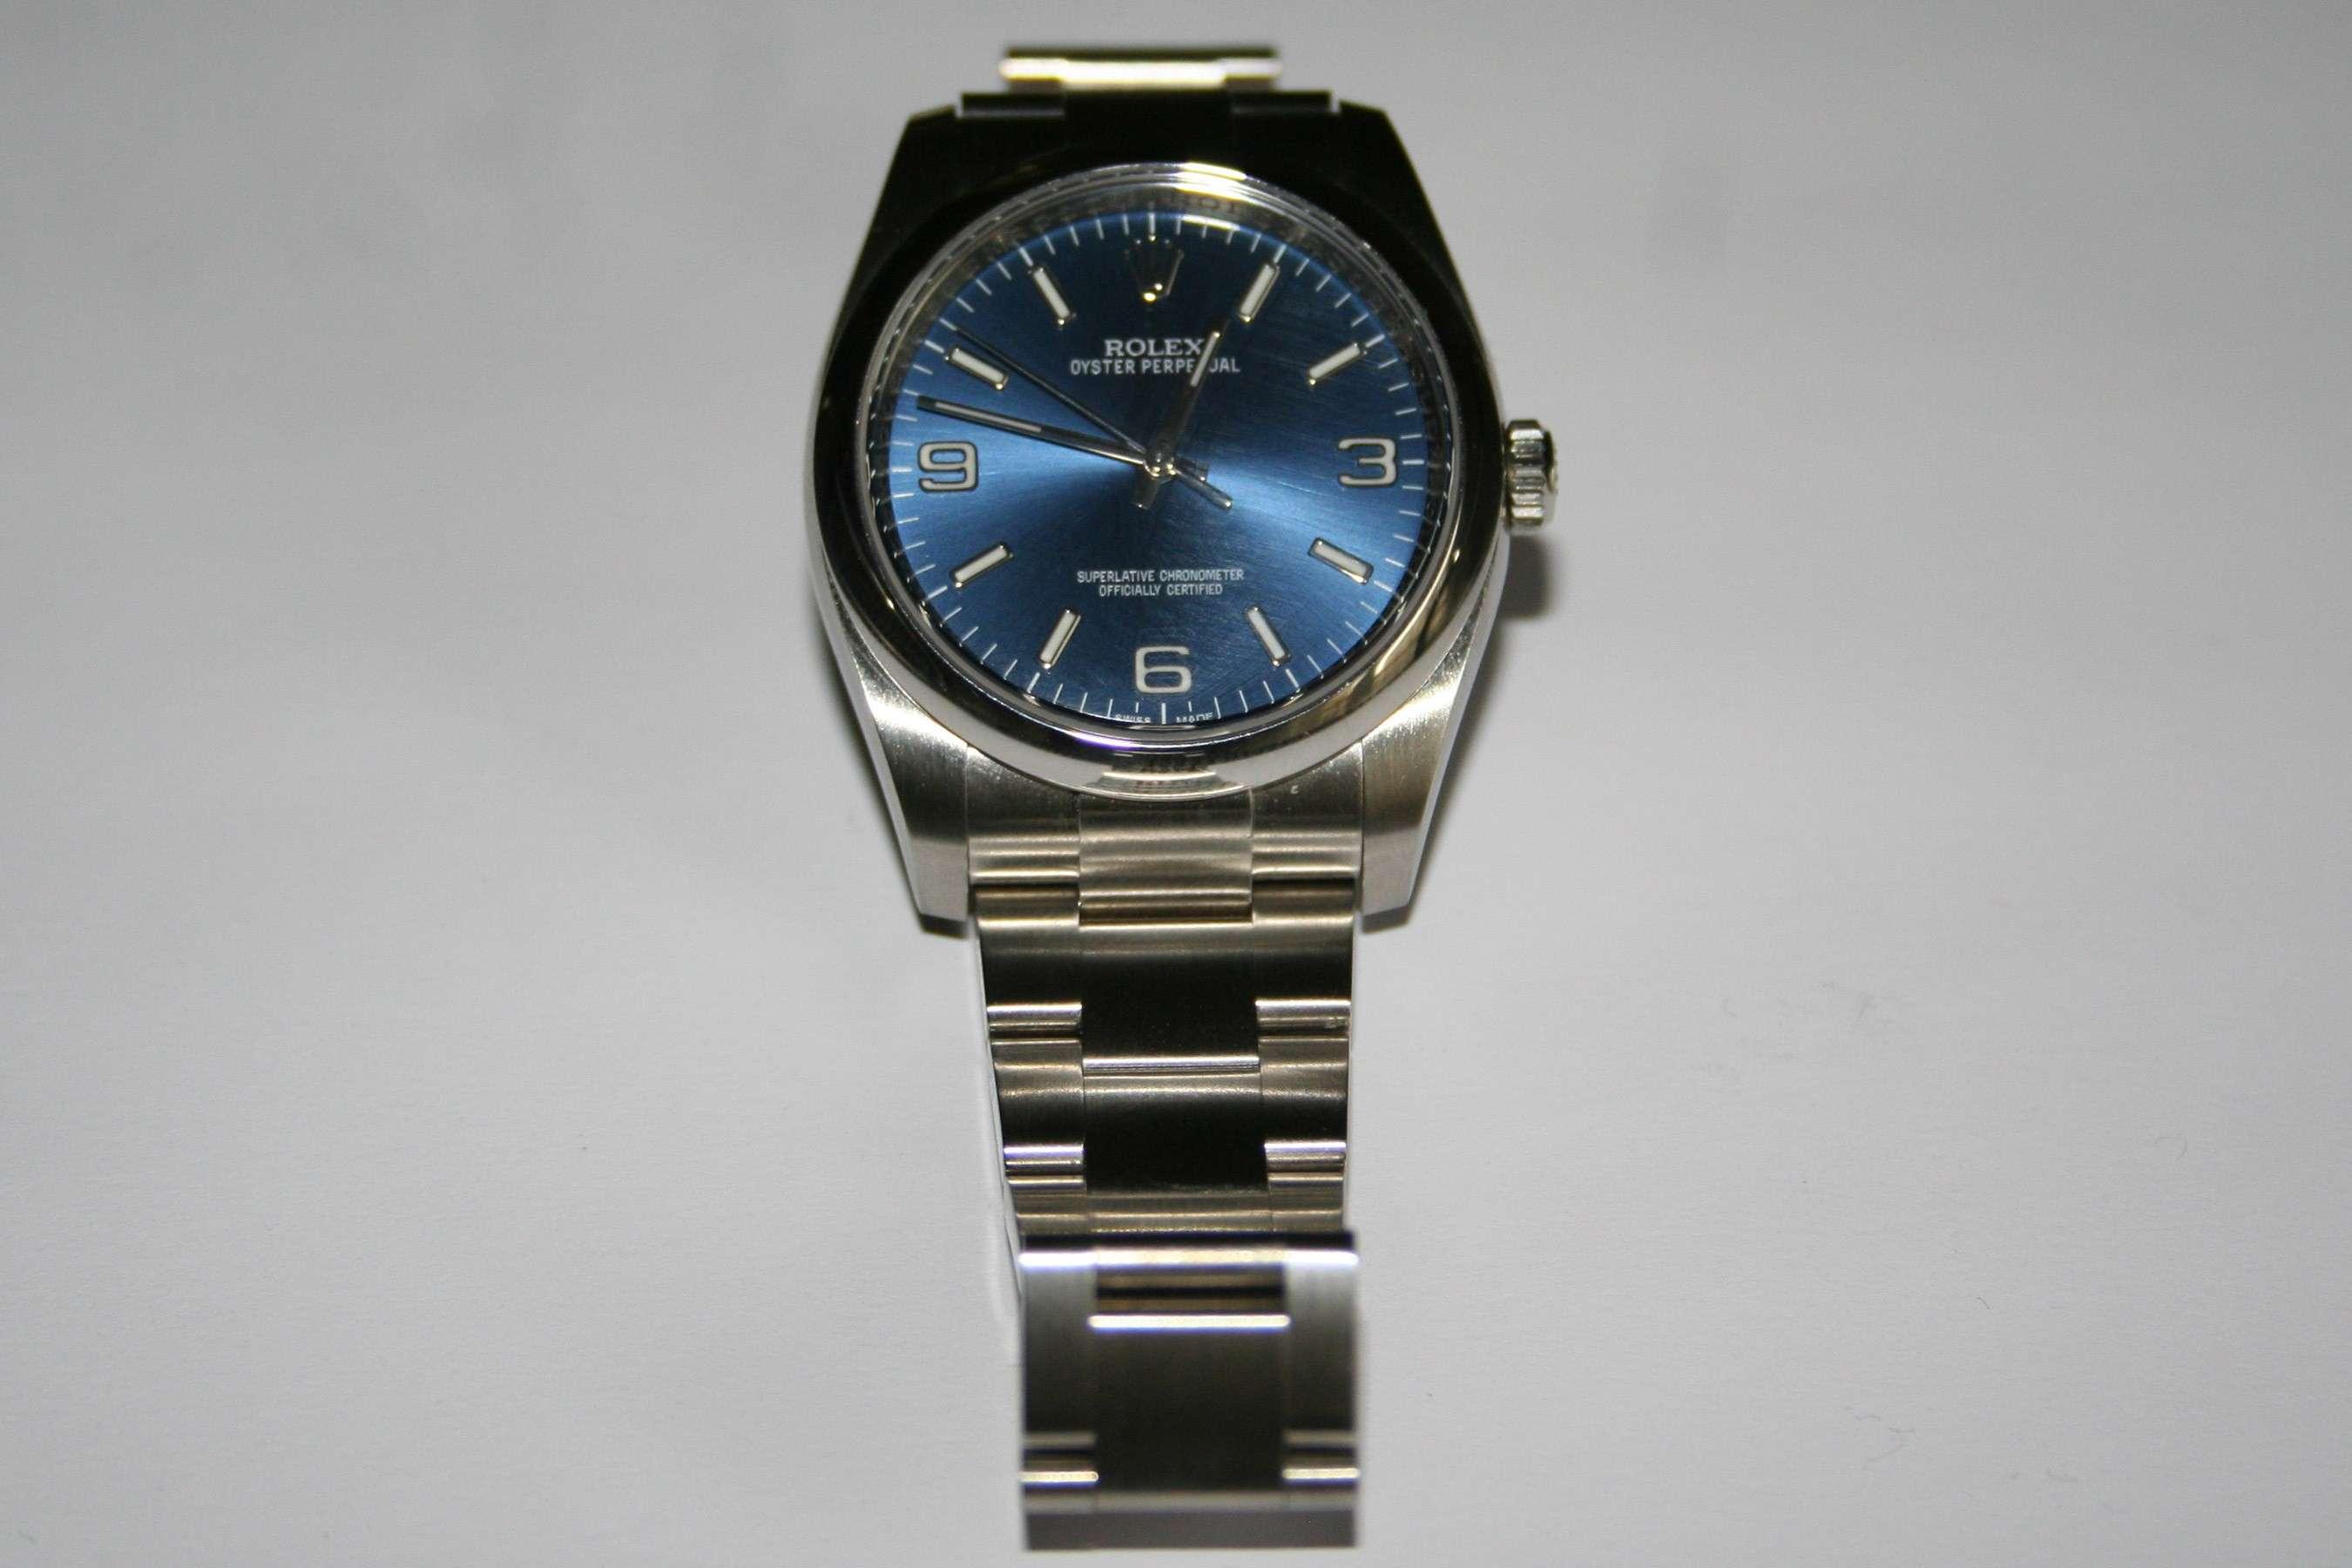 [Vends] Rolex Oyster Perpetual 116000 cadran bleu - comme neuve 111